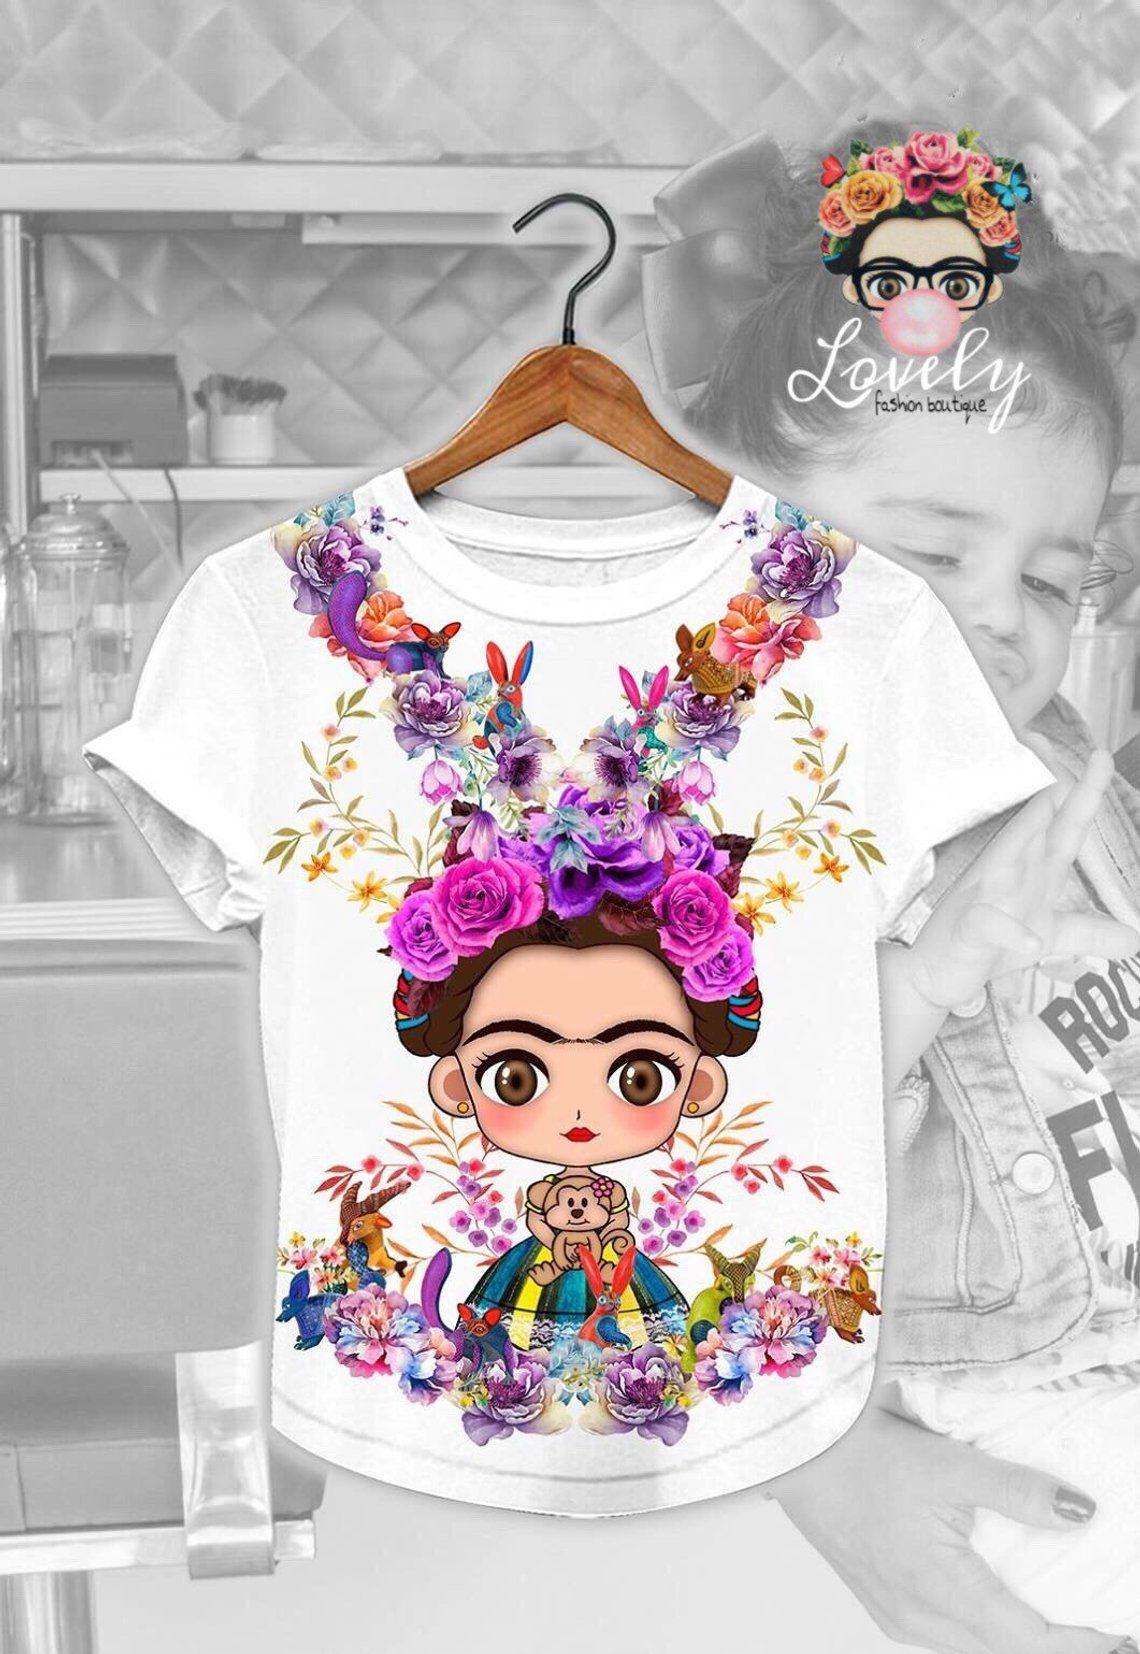 Frida Kahlo Violeta Bloom Camiseta Para Mama E Hija Camisetas